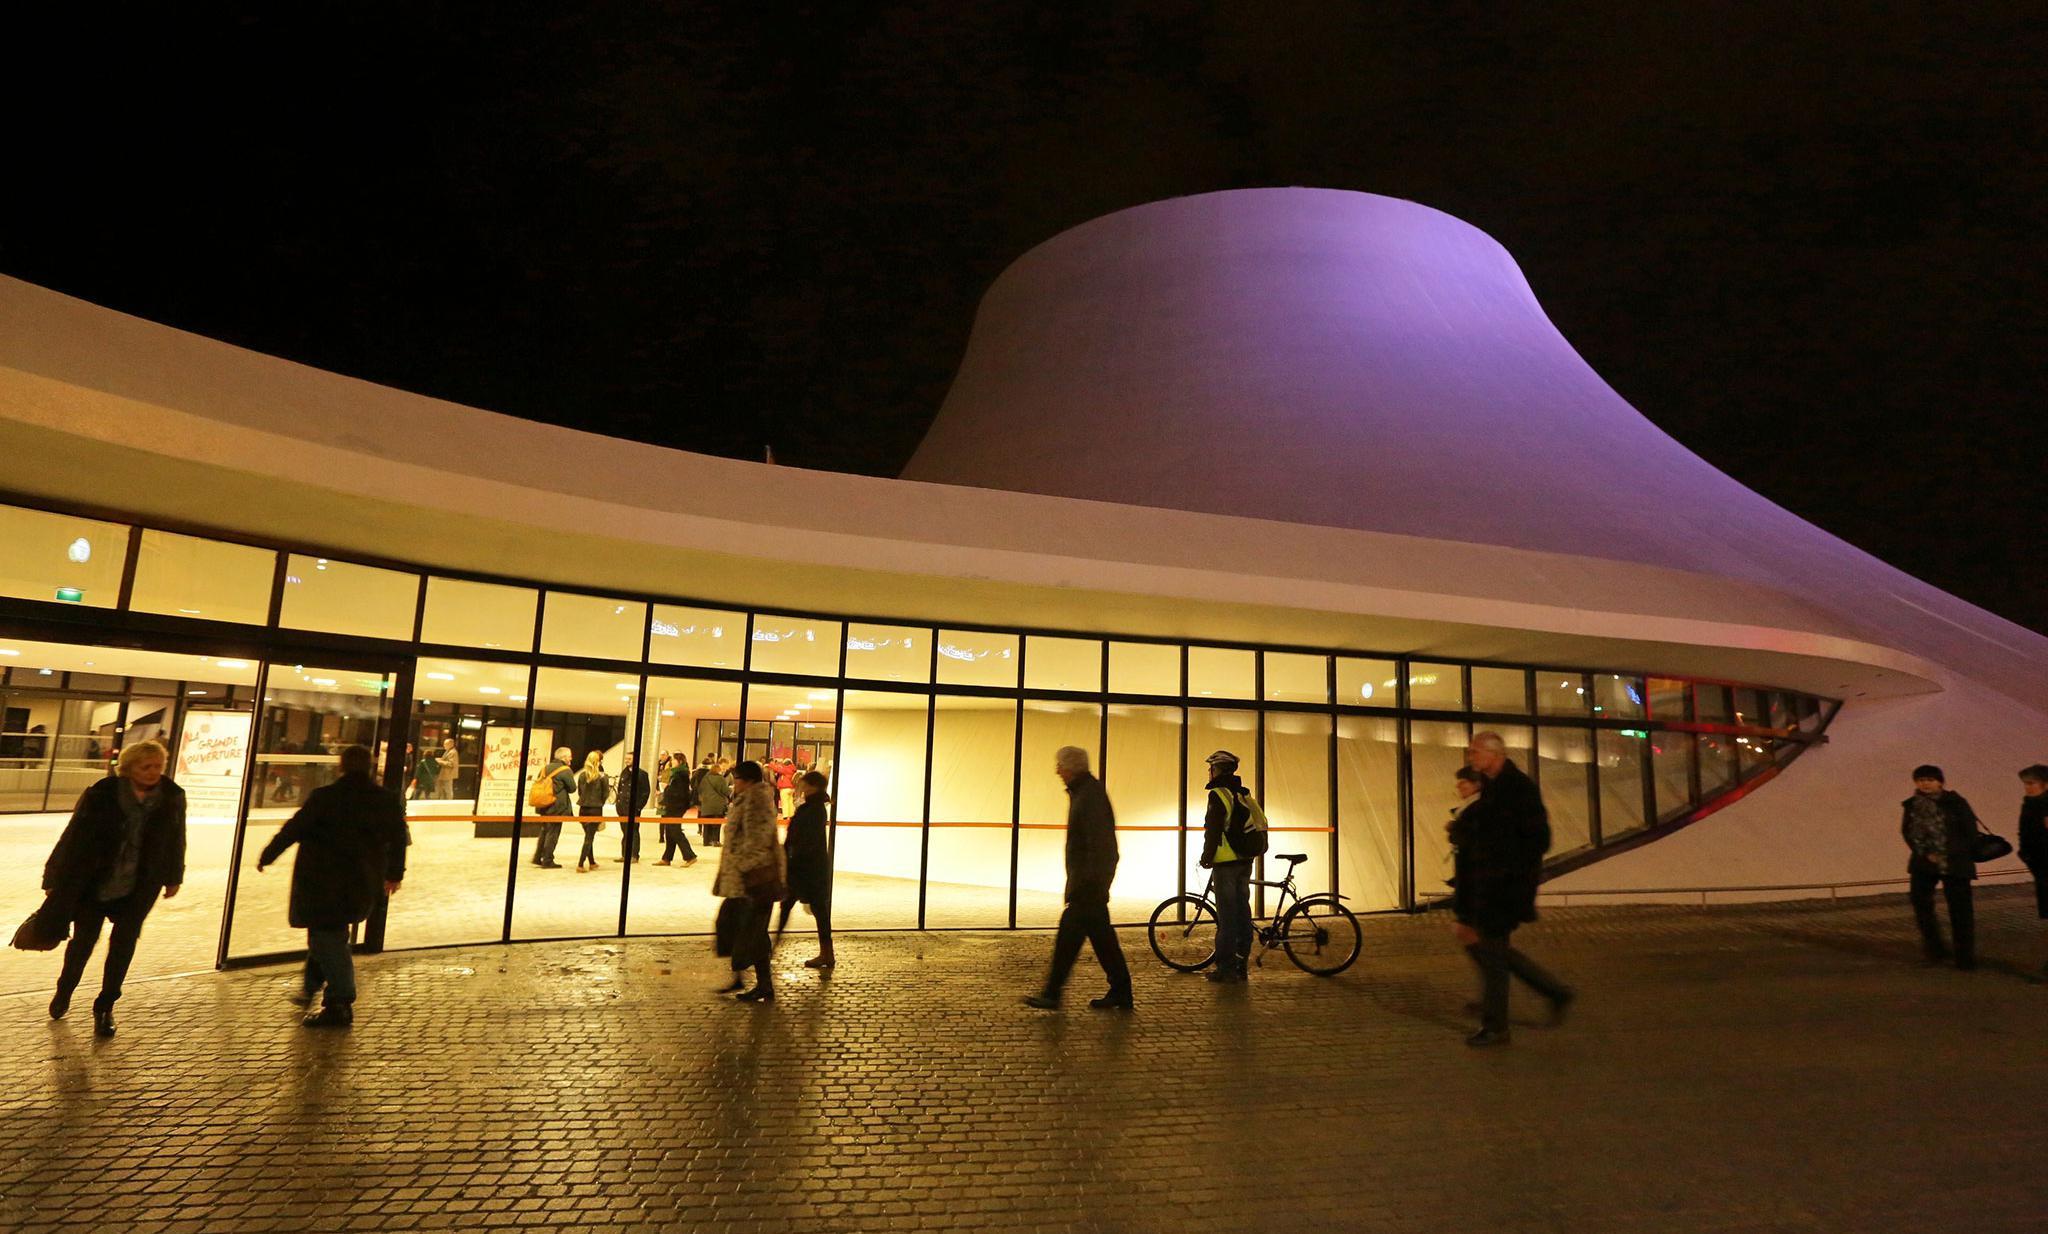 L'espace Oscar Niemeyer de nuit